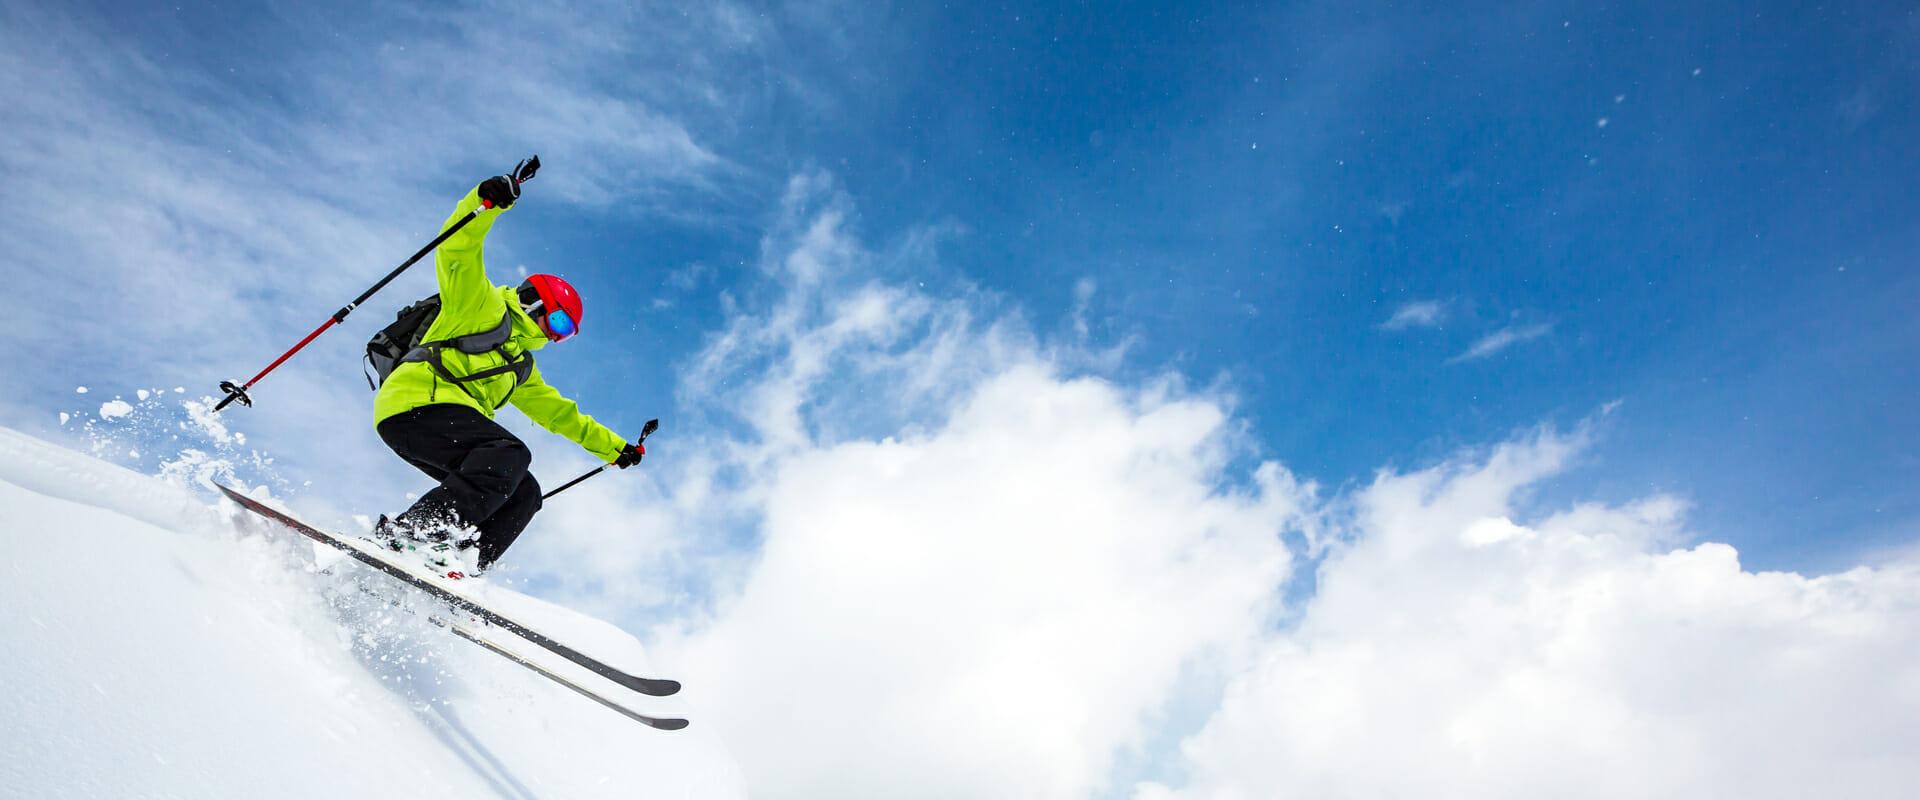 Esquí alpino de descenso